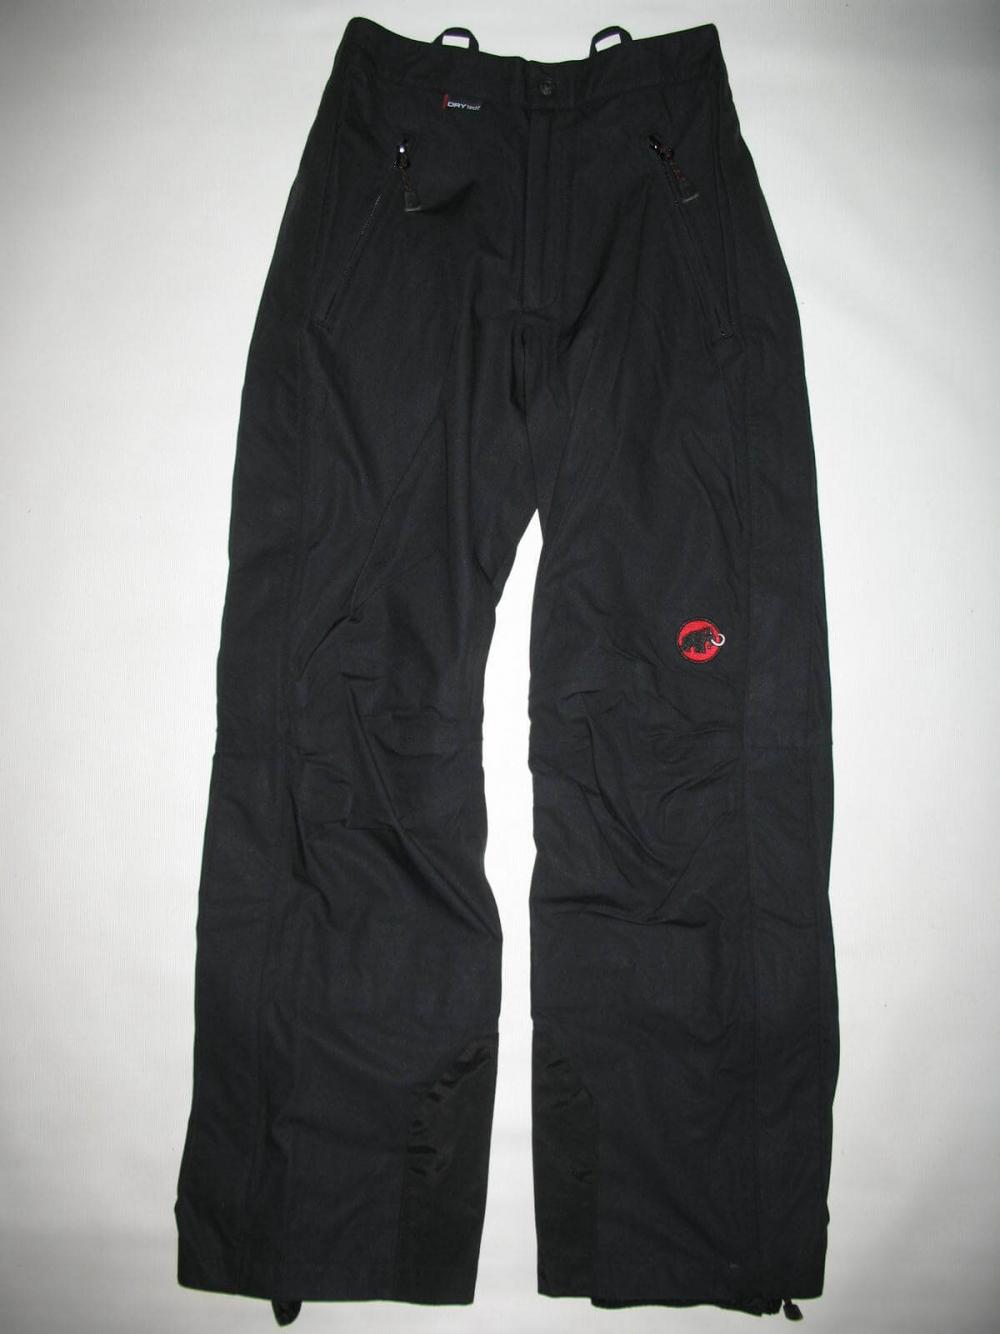 Штаны MAMMUT  waterproof  DRYtech pants (размер S) - 1